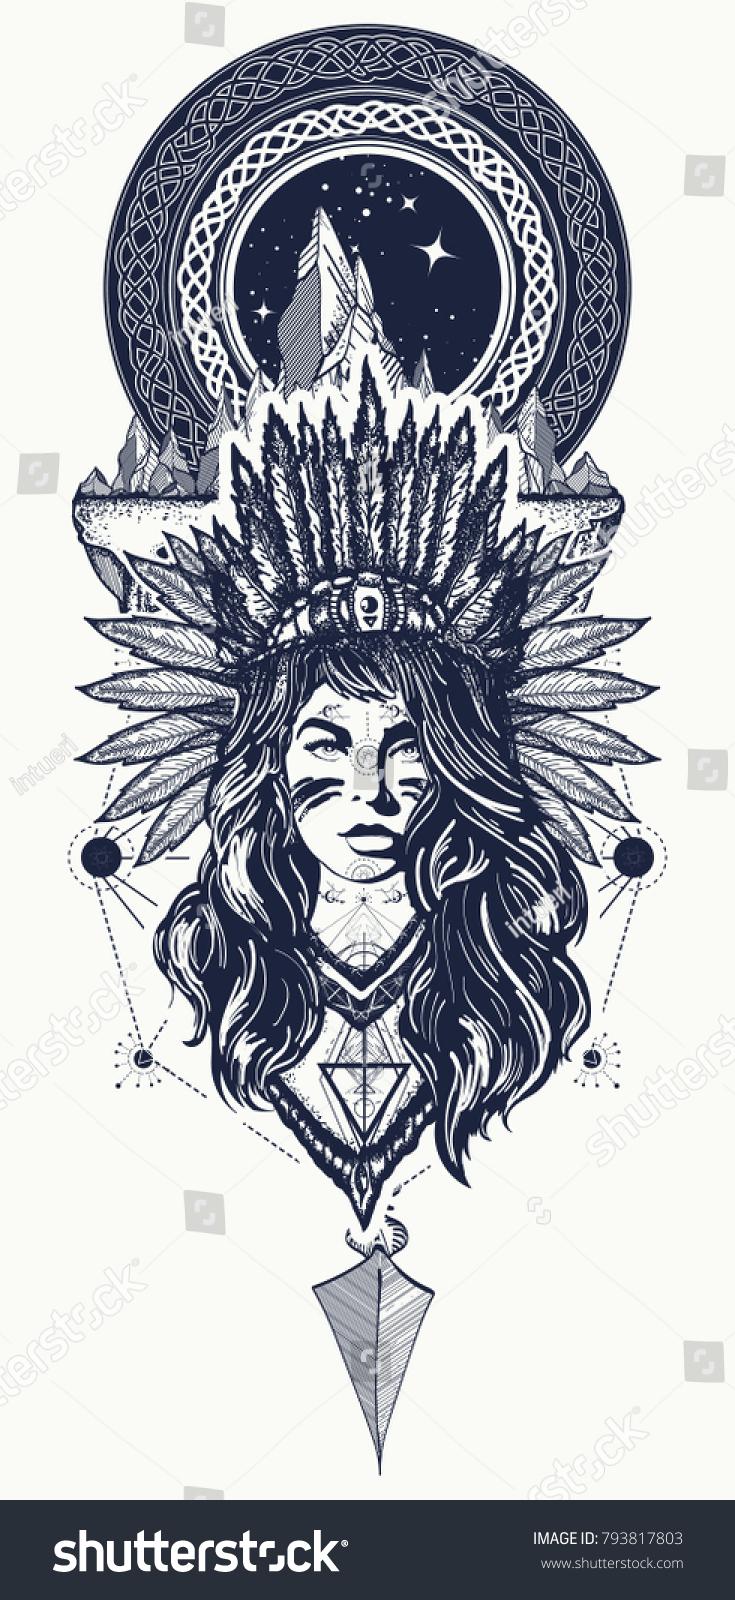 Tribal Woman Mountains Tattoo Tshirt Design Stock Vector Royalty